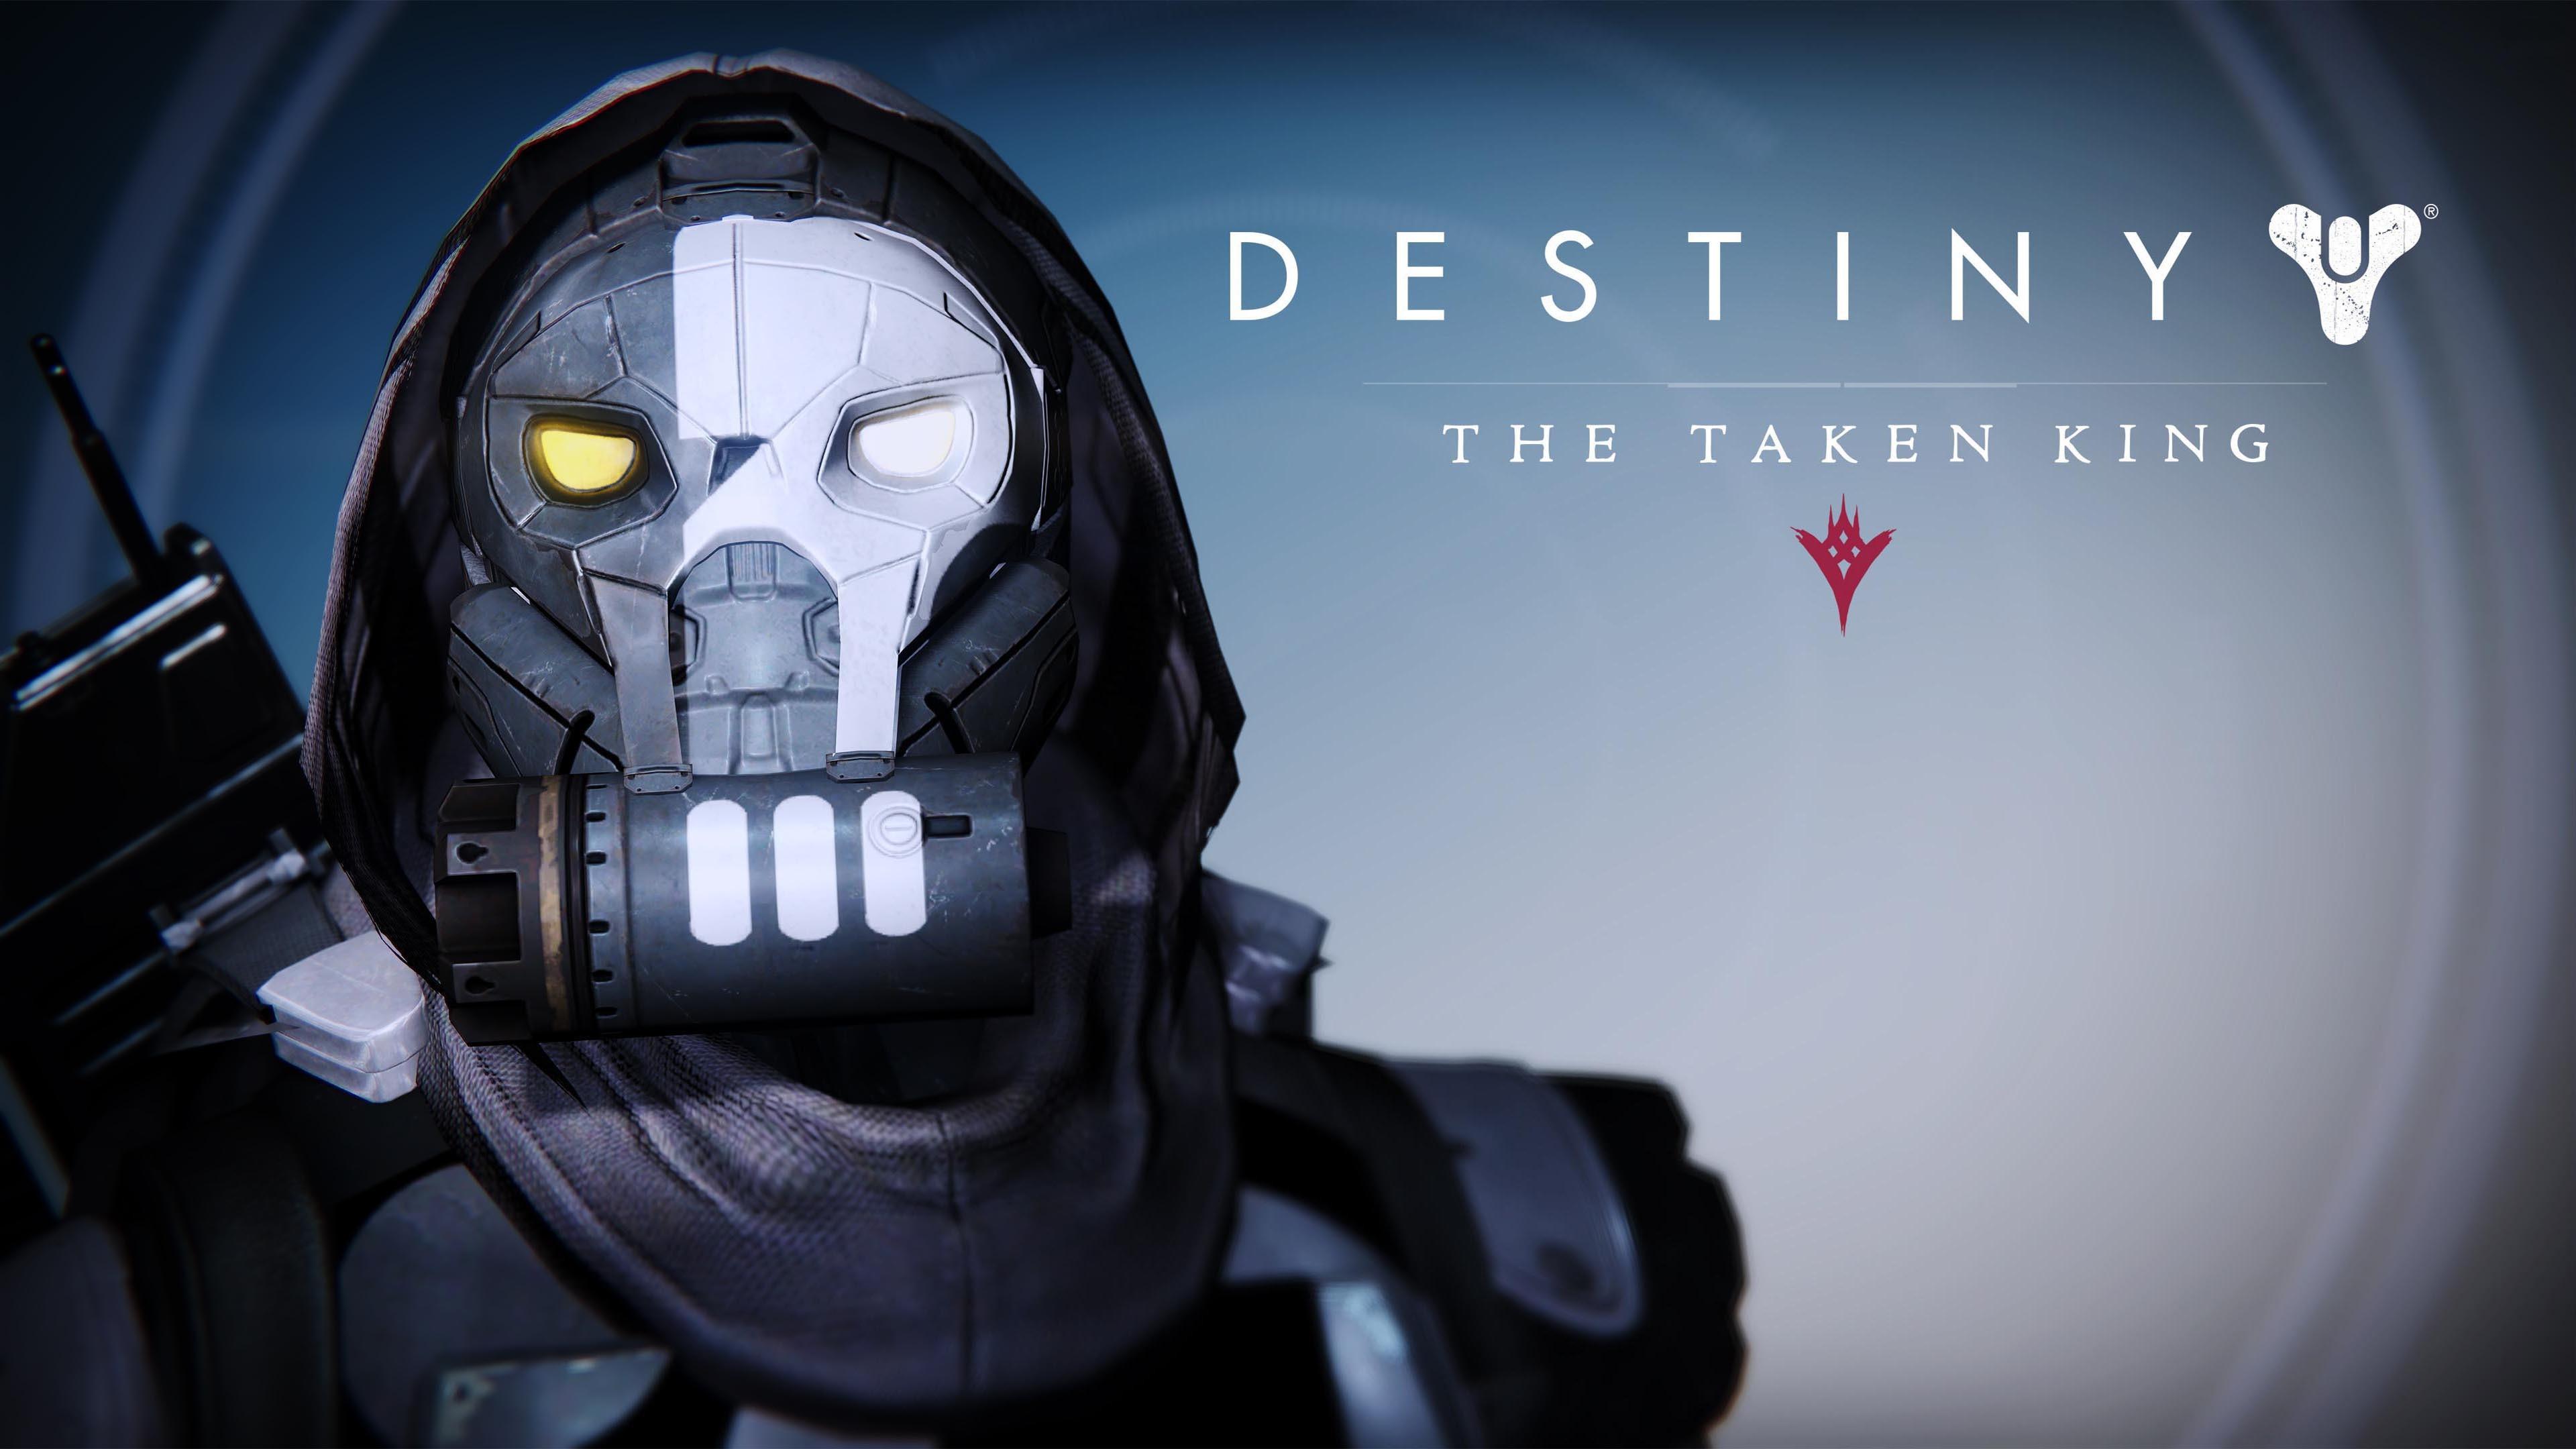 Destiny Dead Orbit Hunter Male Helmet wallpaper